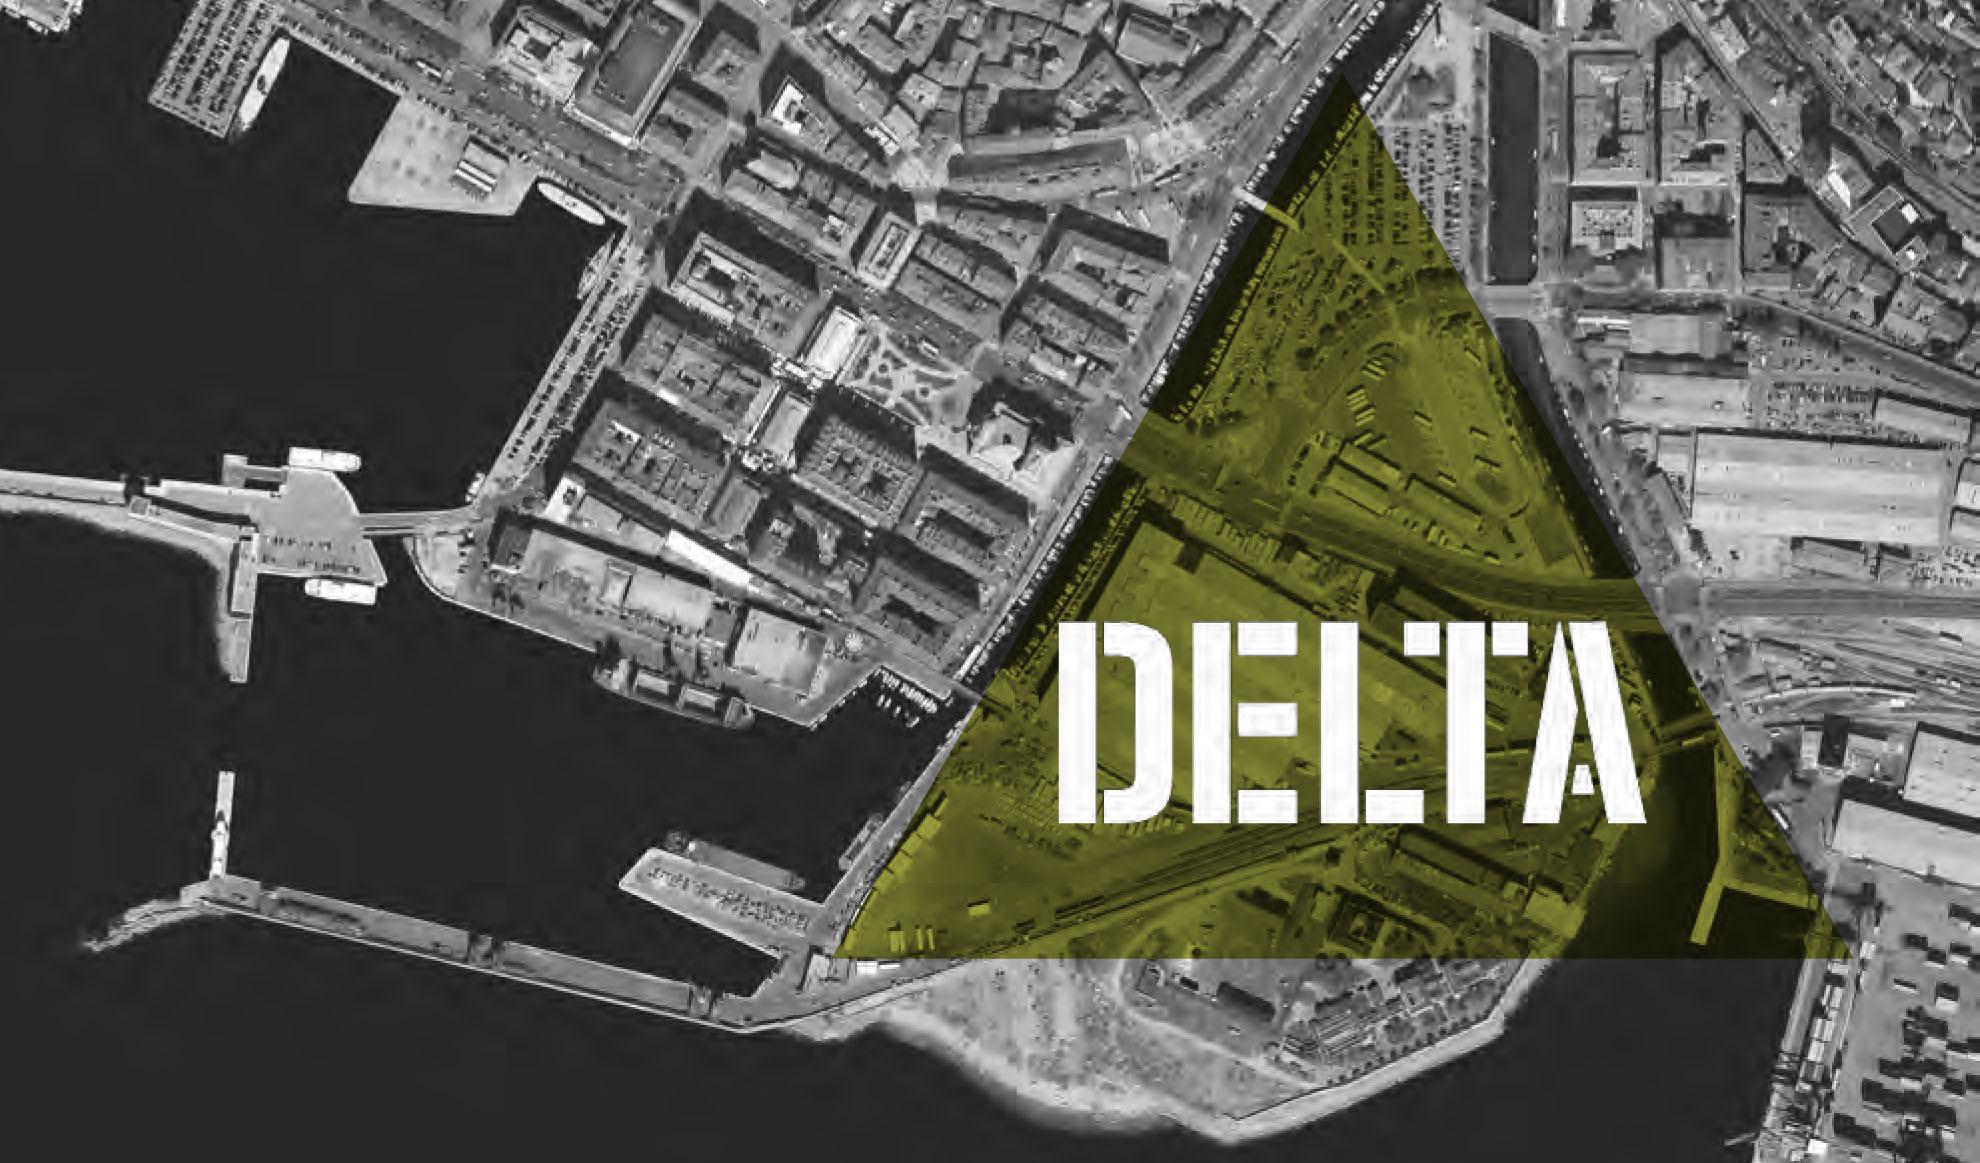 Delta and Porto Baros Area Competition, Courtesy of Rijeka Architects Association (DAR)